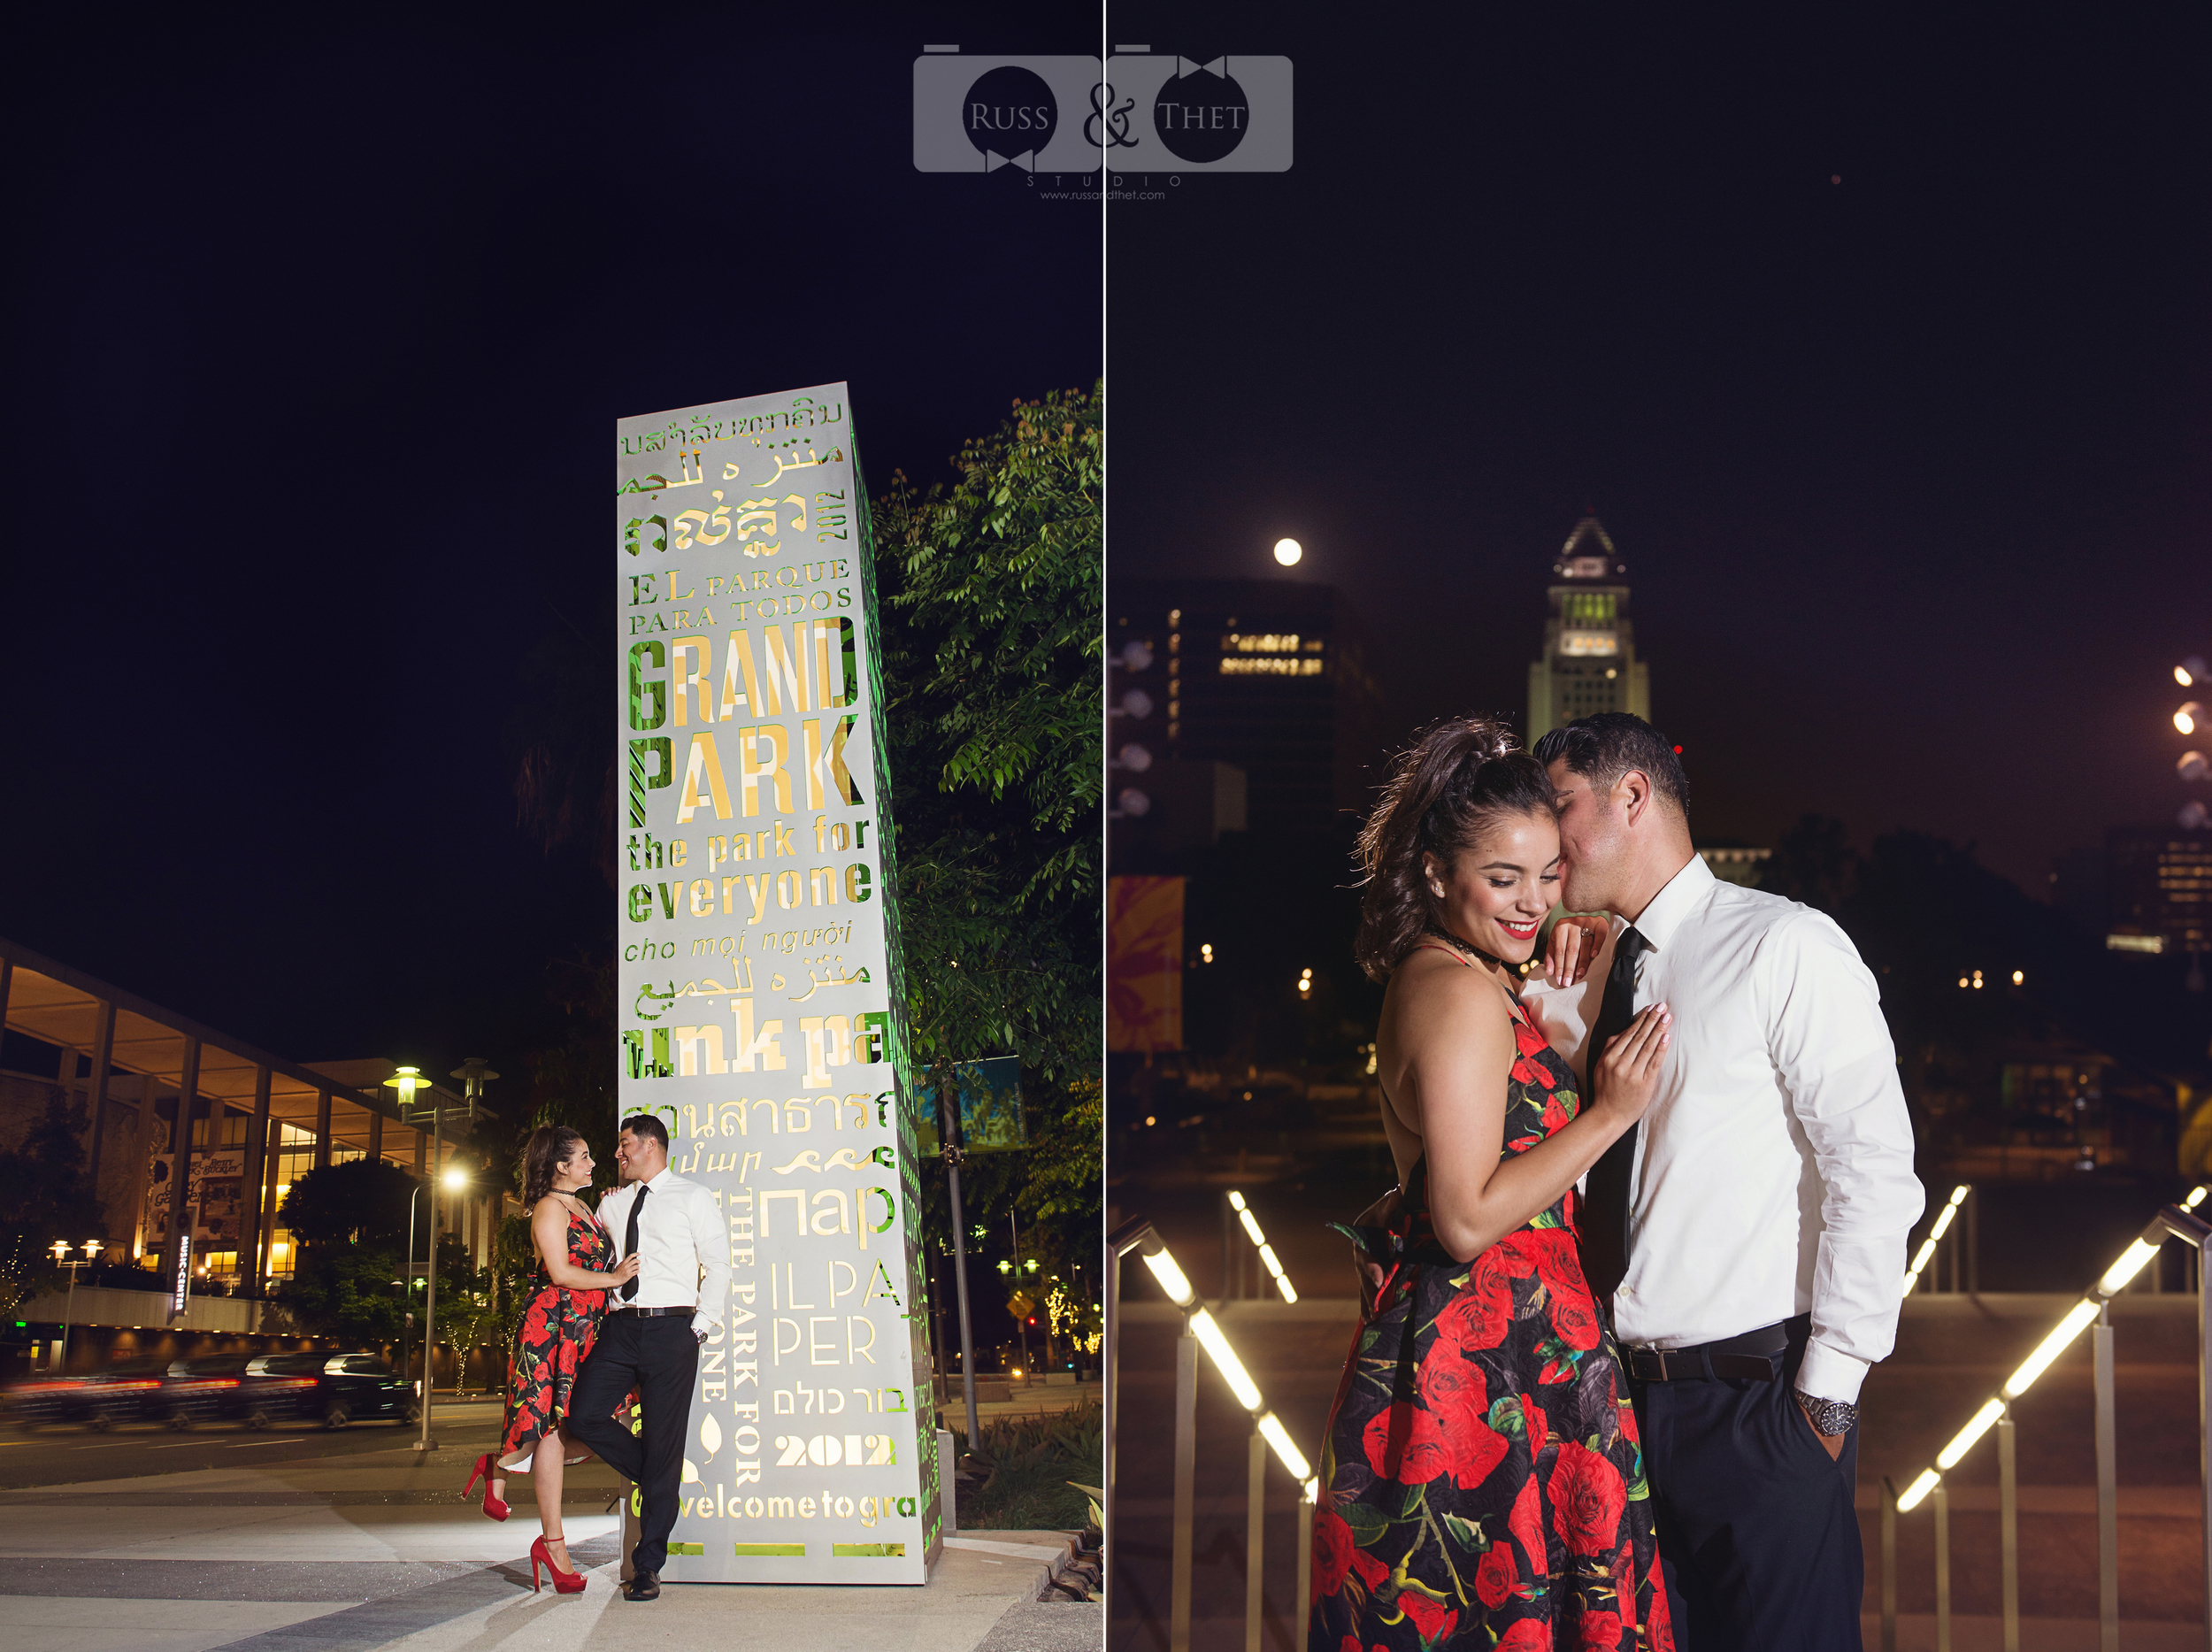 Los-Angeles-Engagement-Photographer_1.jpg